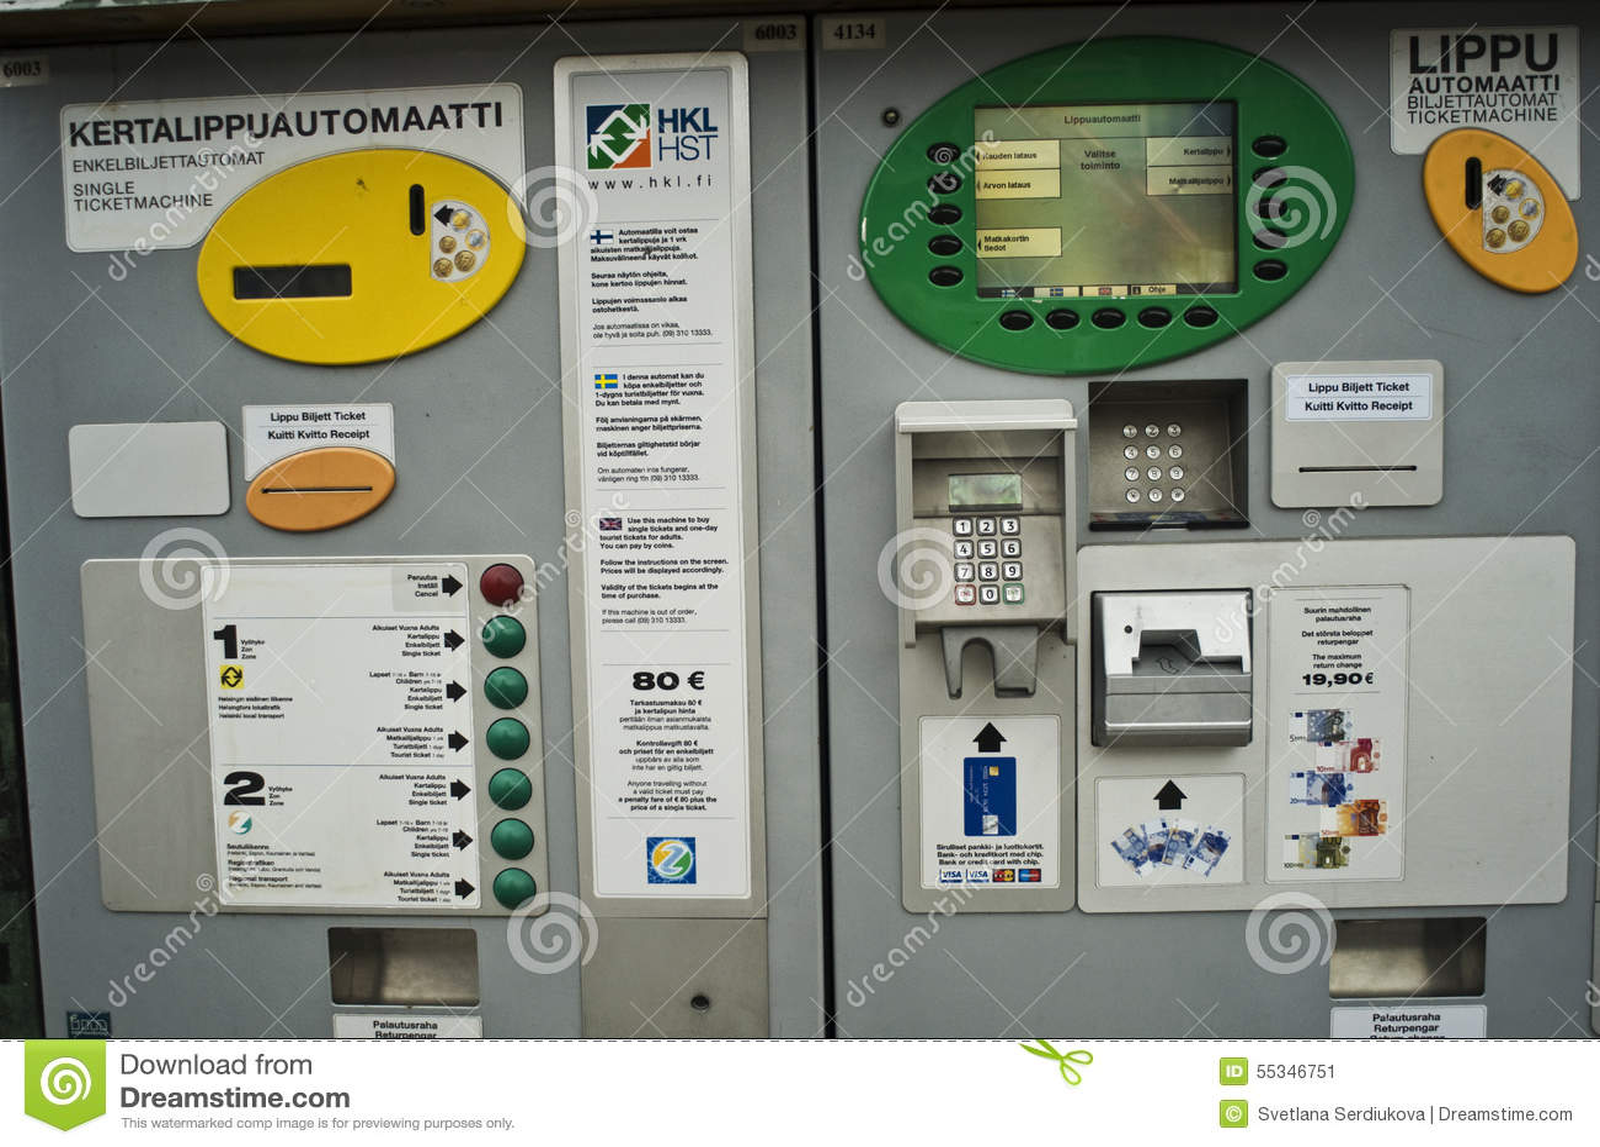 Automatic Ticket Vending Machine in Helsinki, Finland